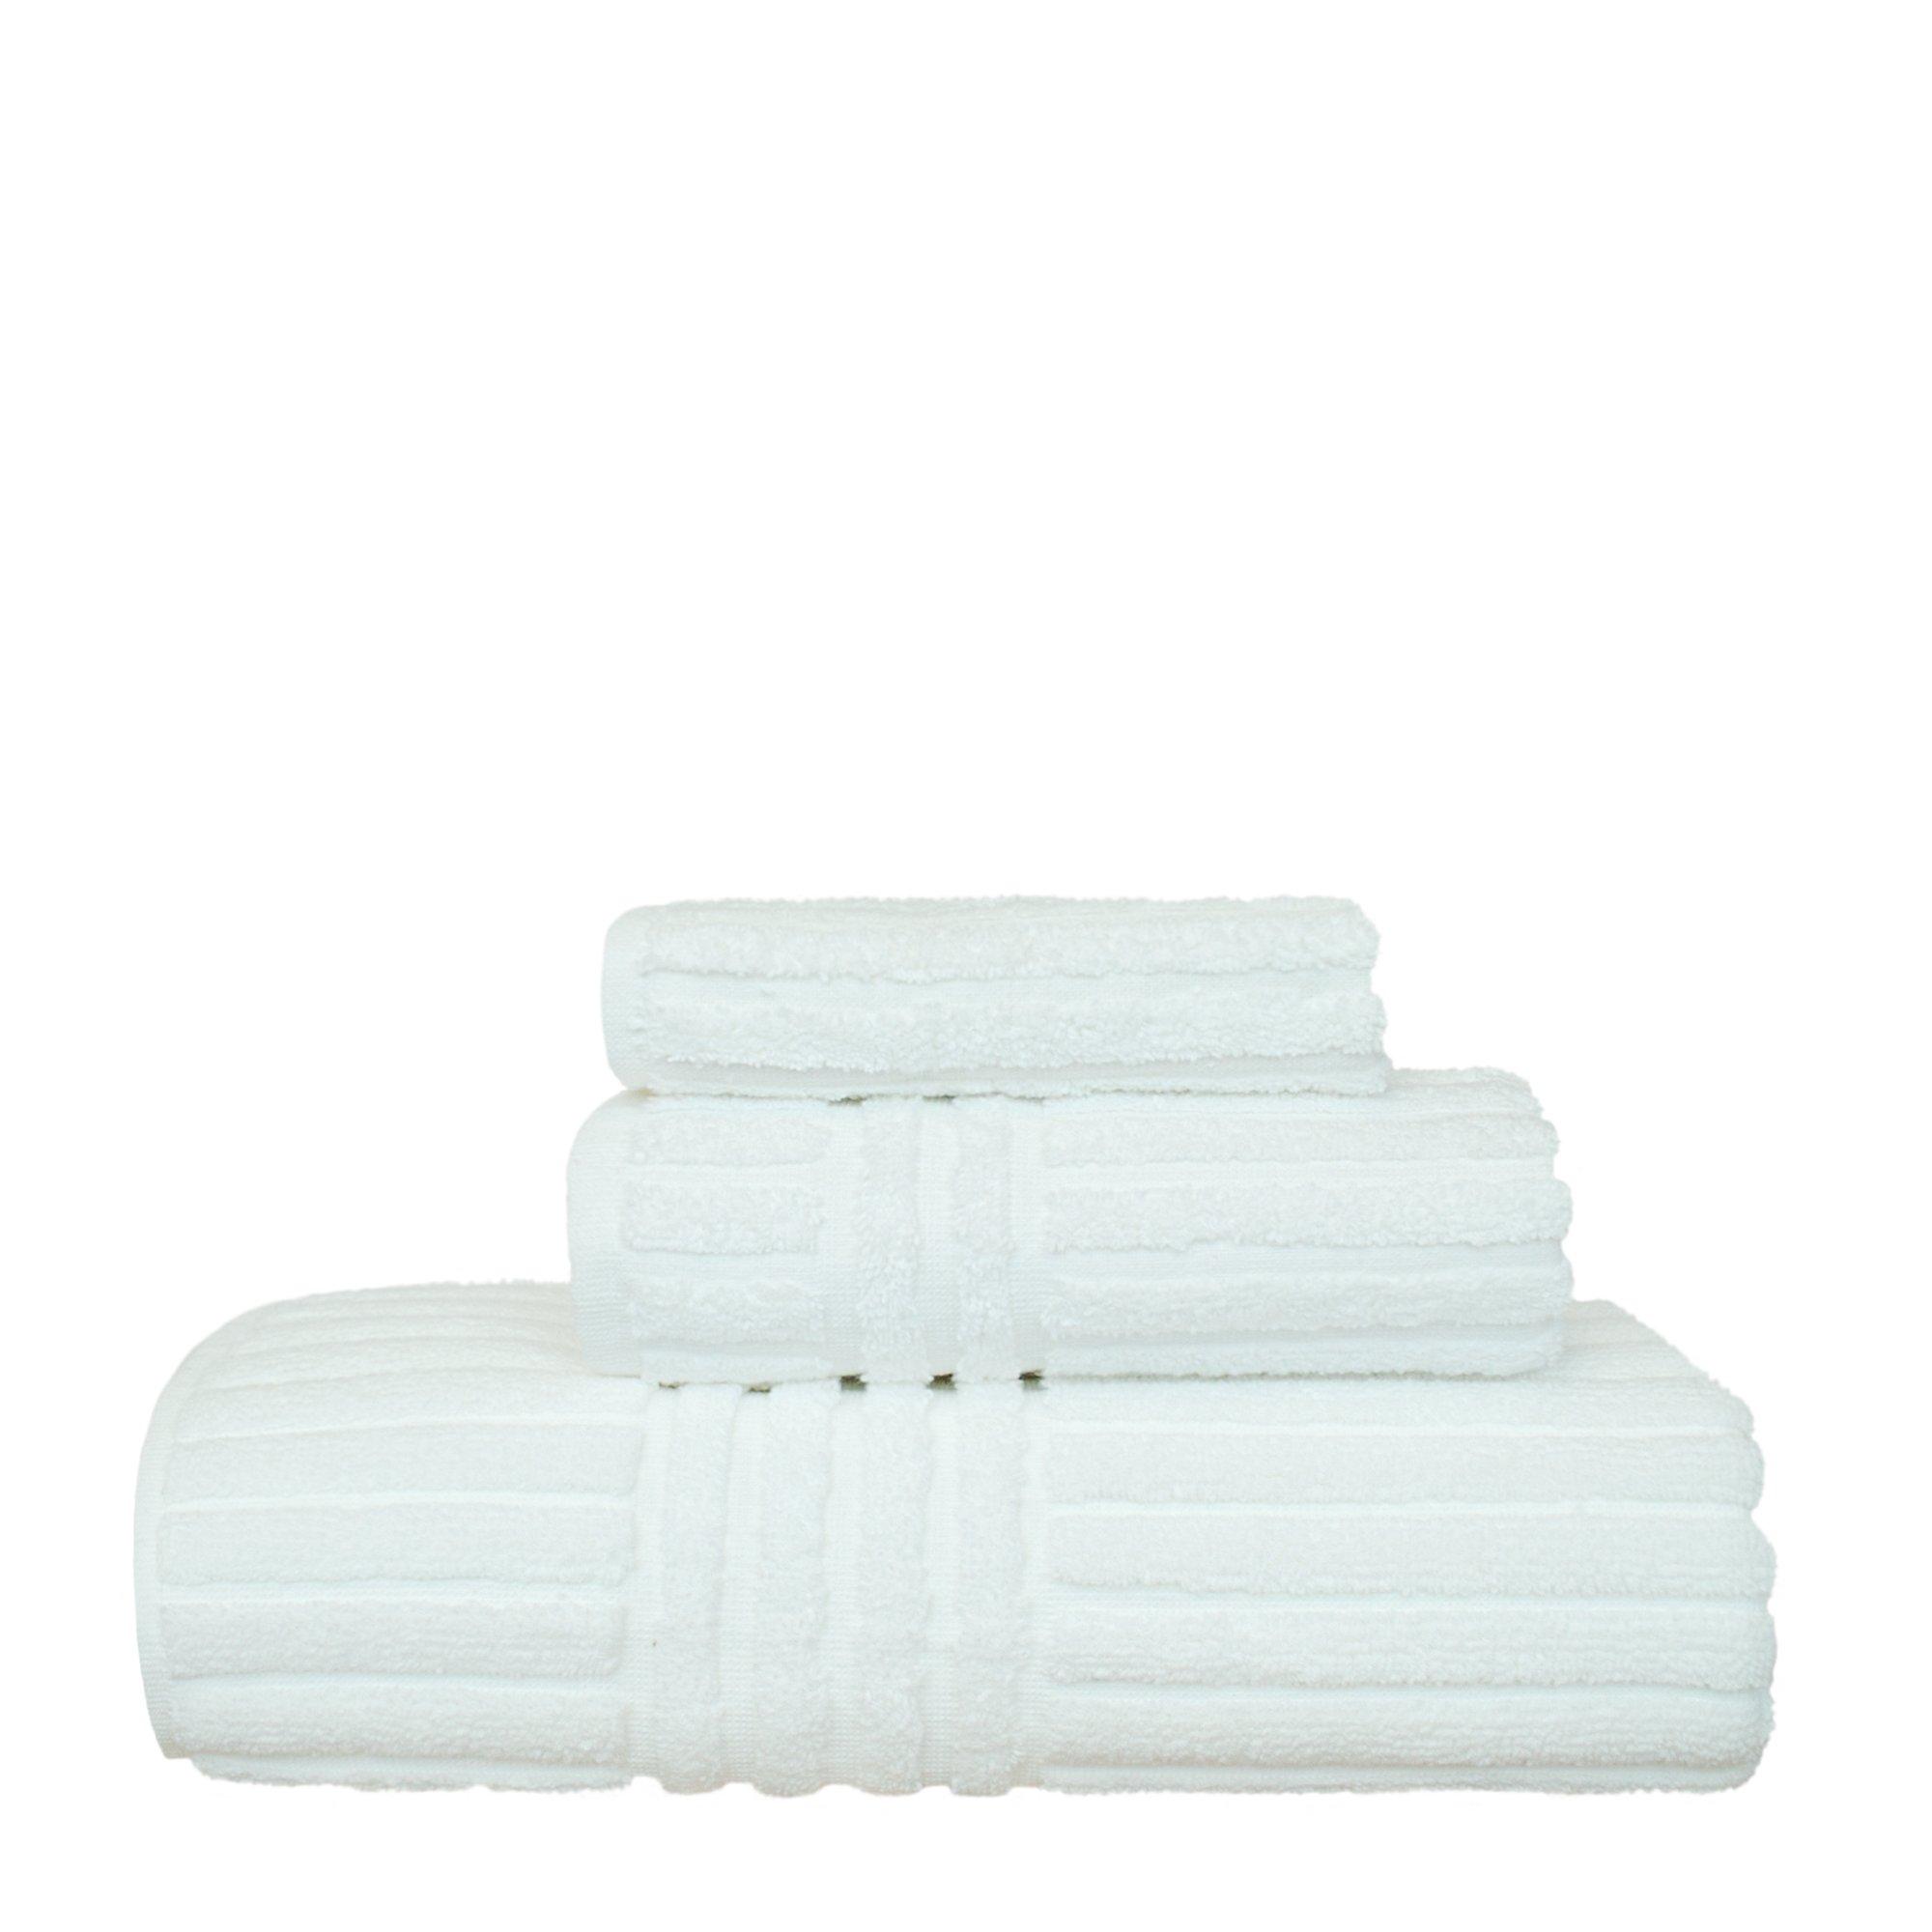 BC BARE COTTON 3 Piece Luxury Hotel & Spa Towel 100% Turkish Cotton Striped Set, Set of 3, White, 3